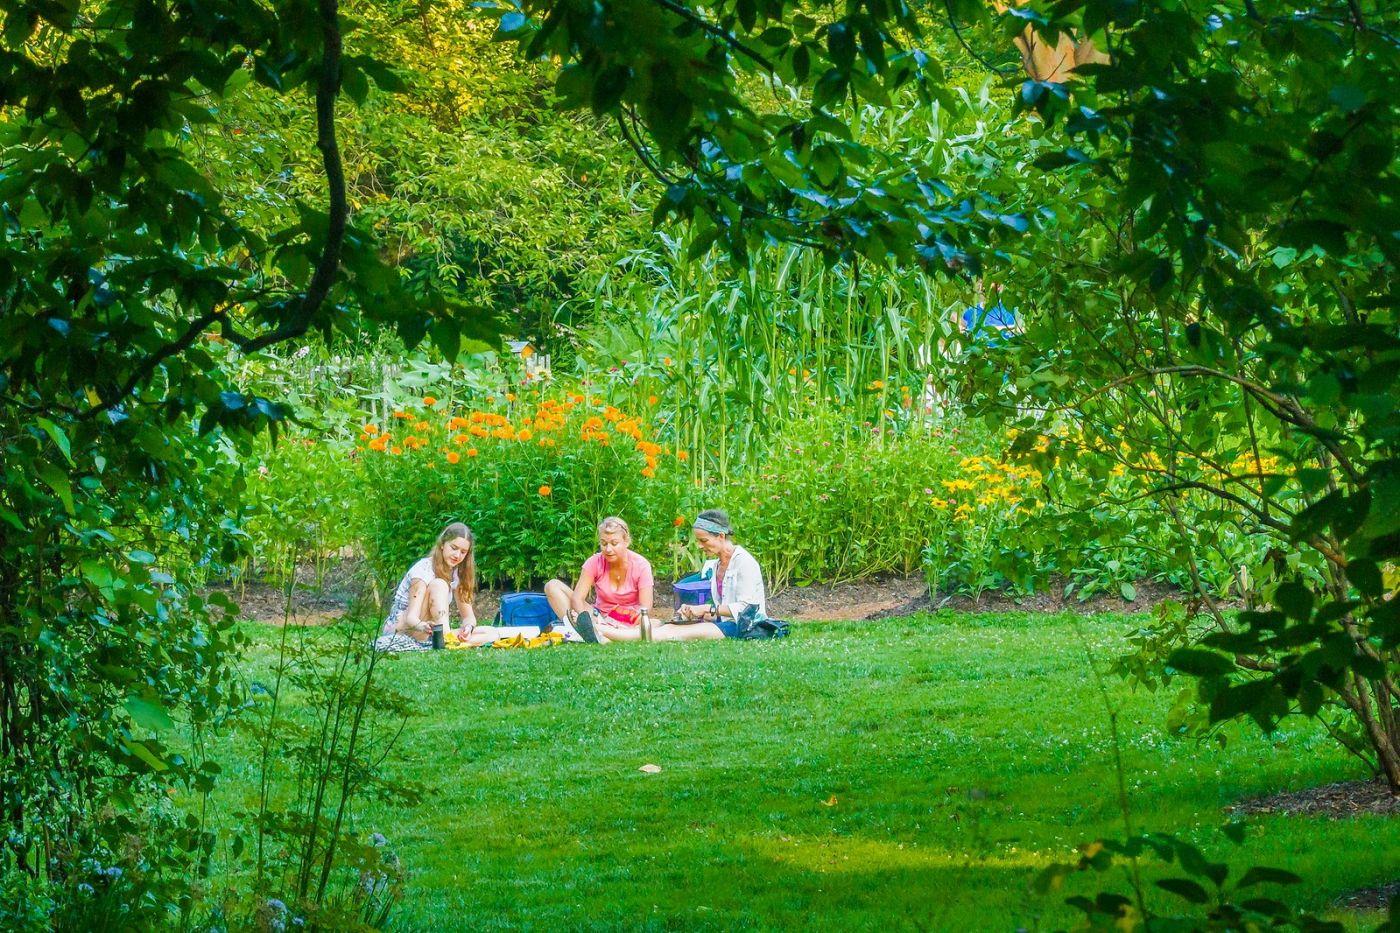 Chanticleer花园,享受大自然_图1-33